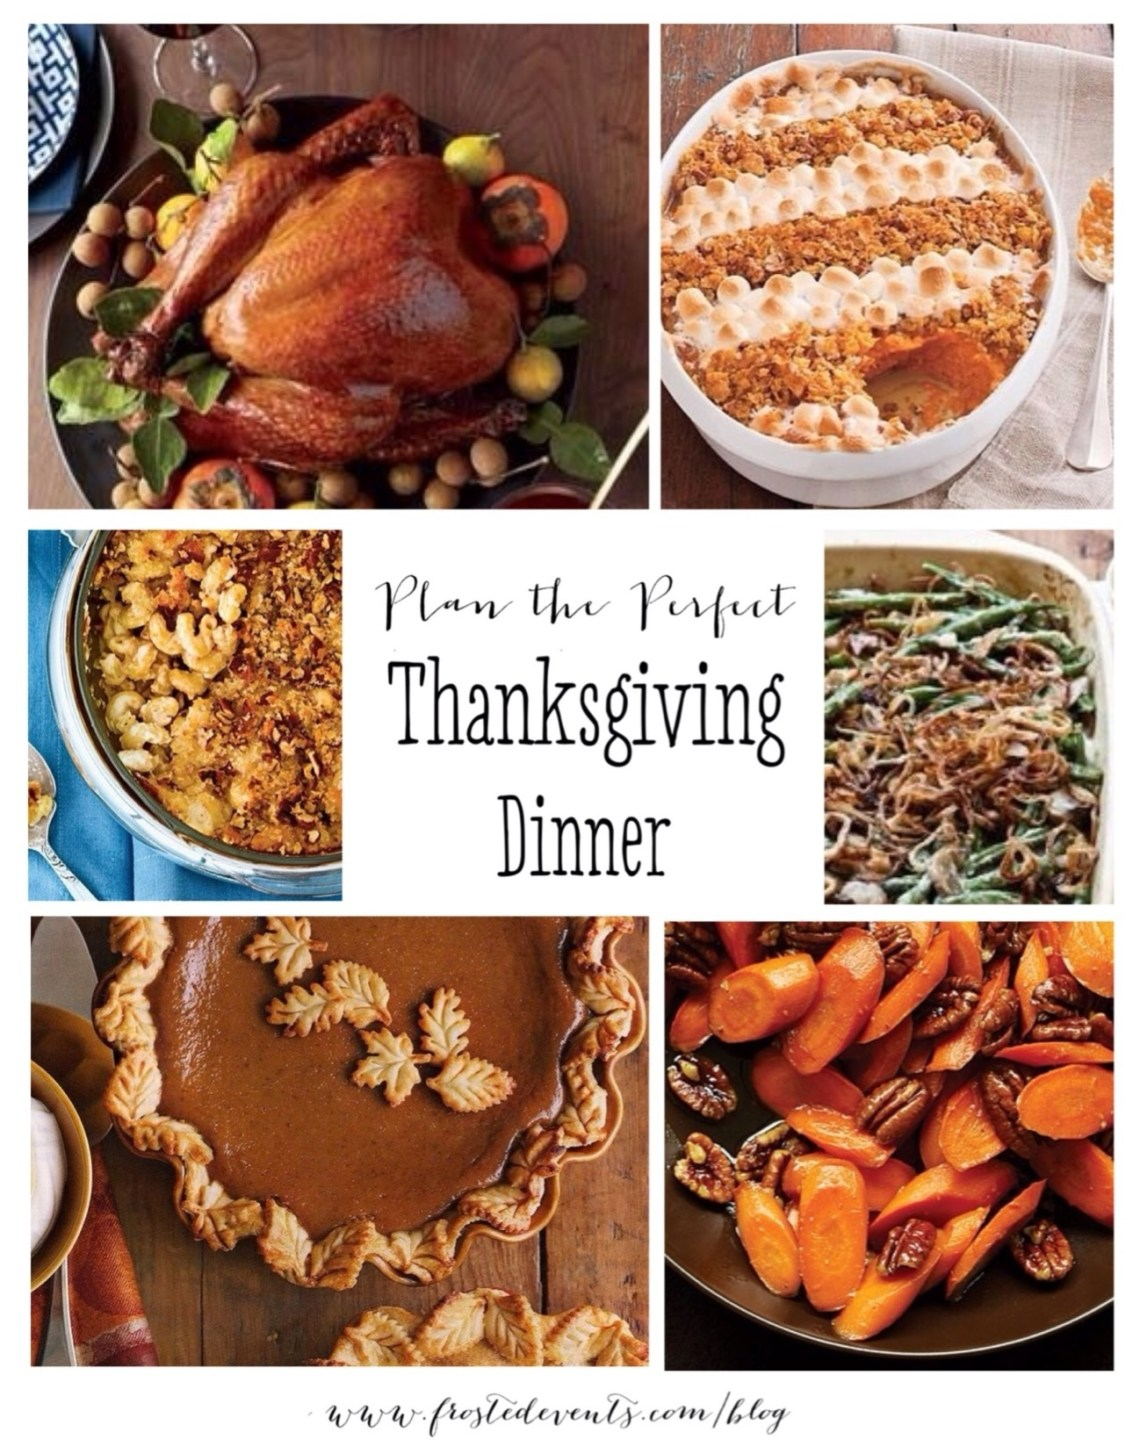 Thanksgiving Dinner Menu - Plan the Perfect Thanksgiving Dinner - www.frostedevents.com Thanksgiving Ideas & Inspiration